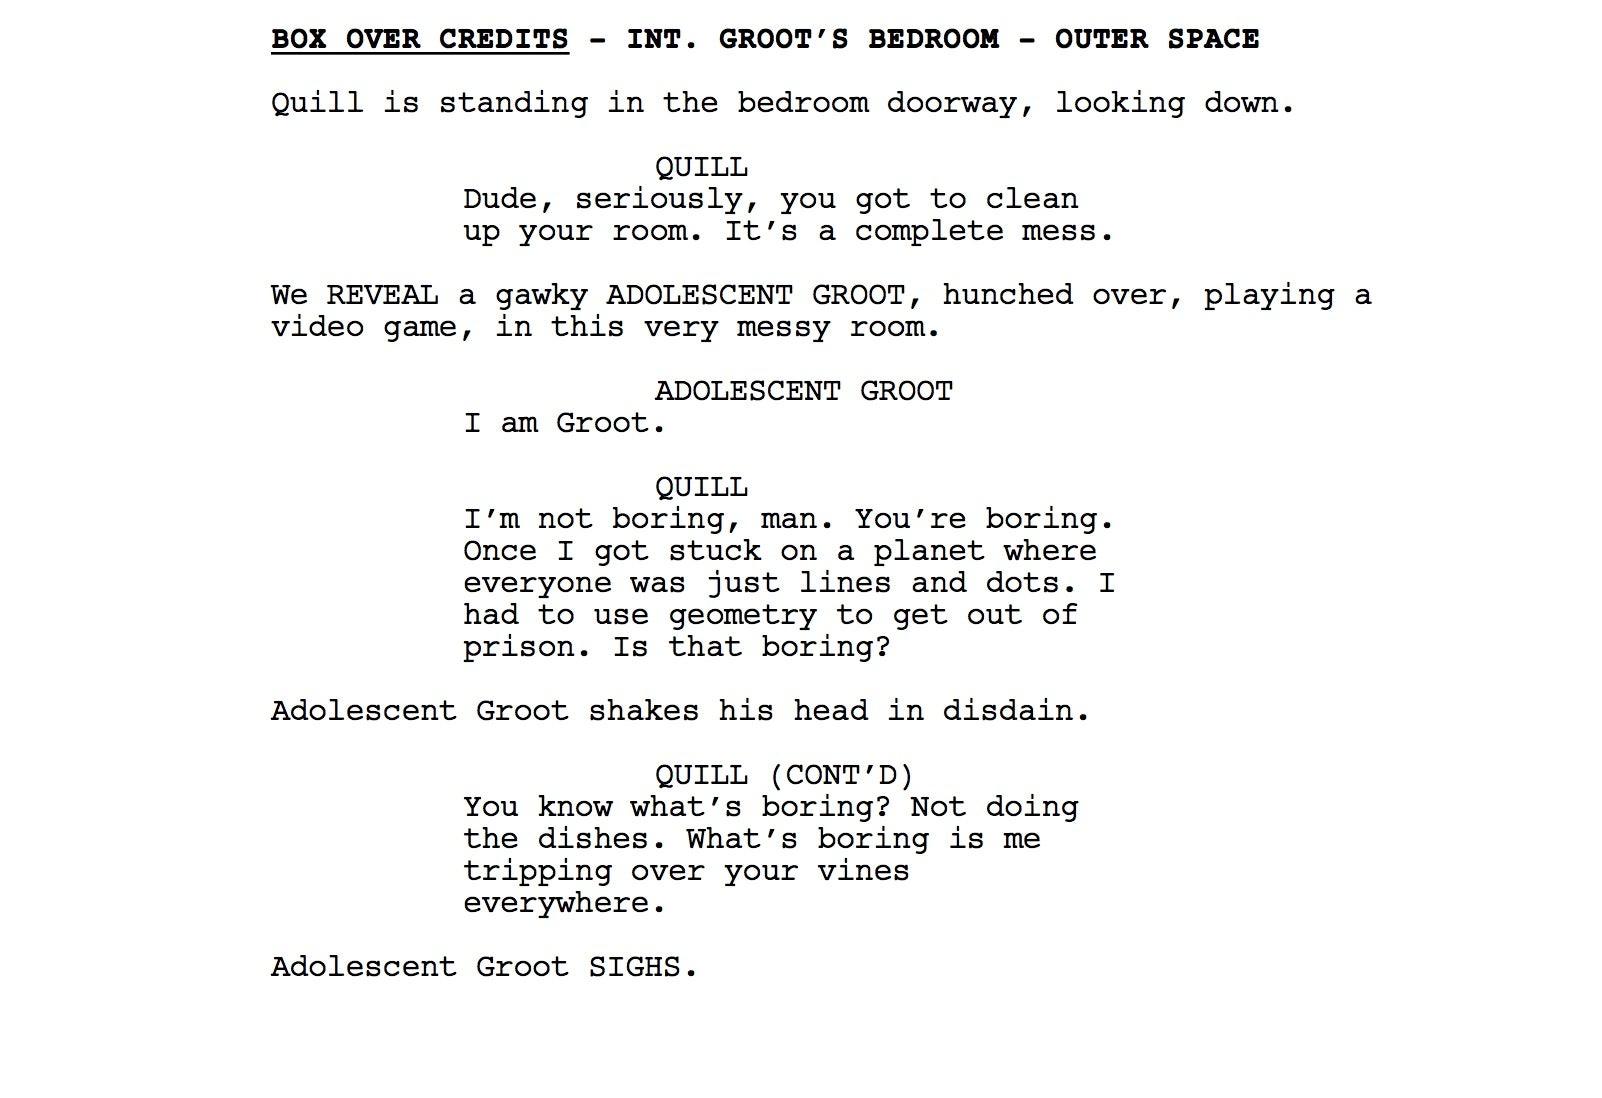 James Gunn releases Guardians of the Galaxy Vol. 2 script online